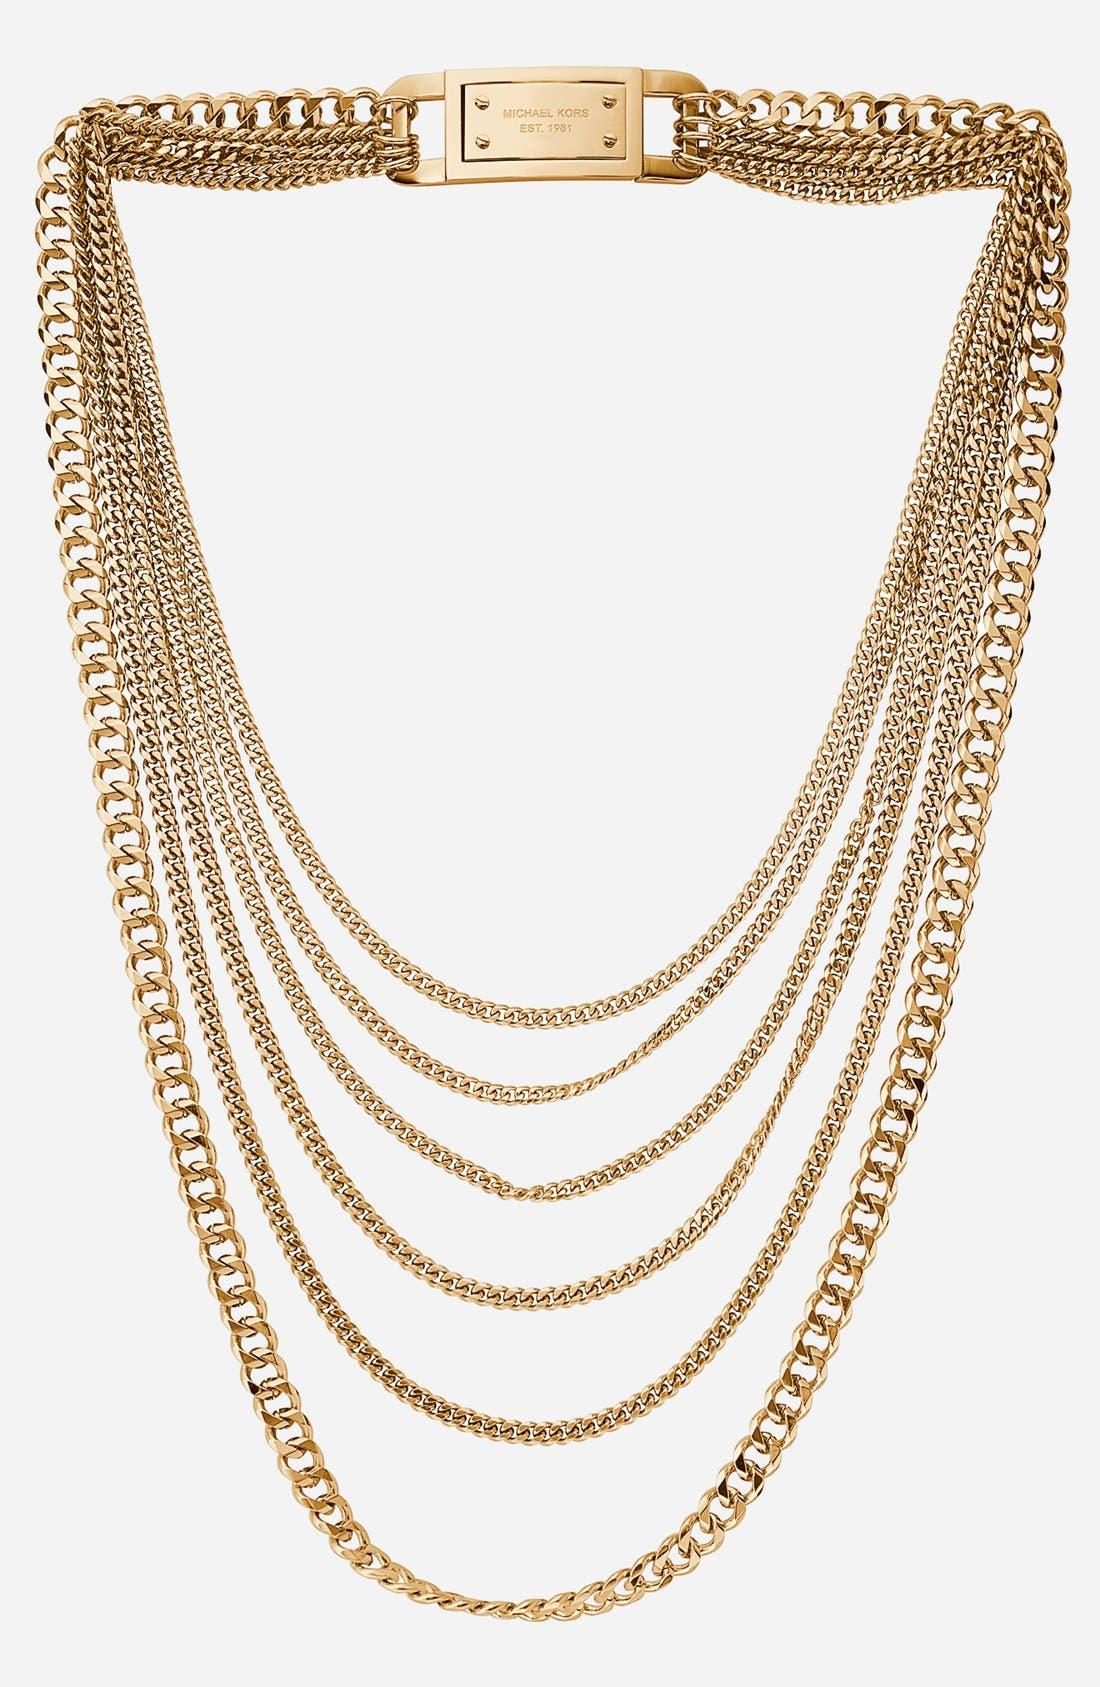 Main Image - Michael Kors Multistrand Link Necklace